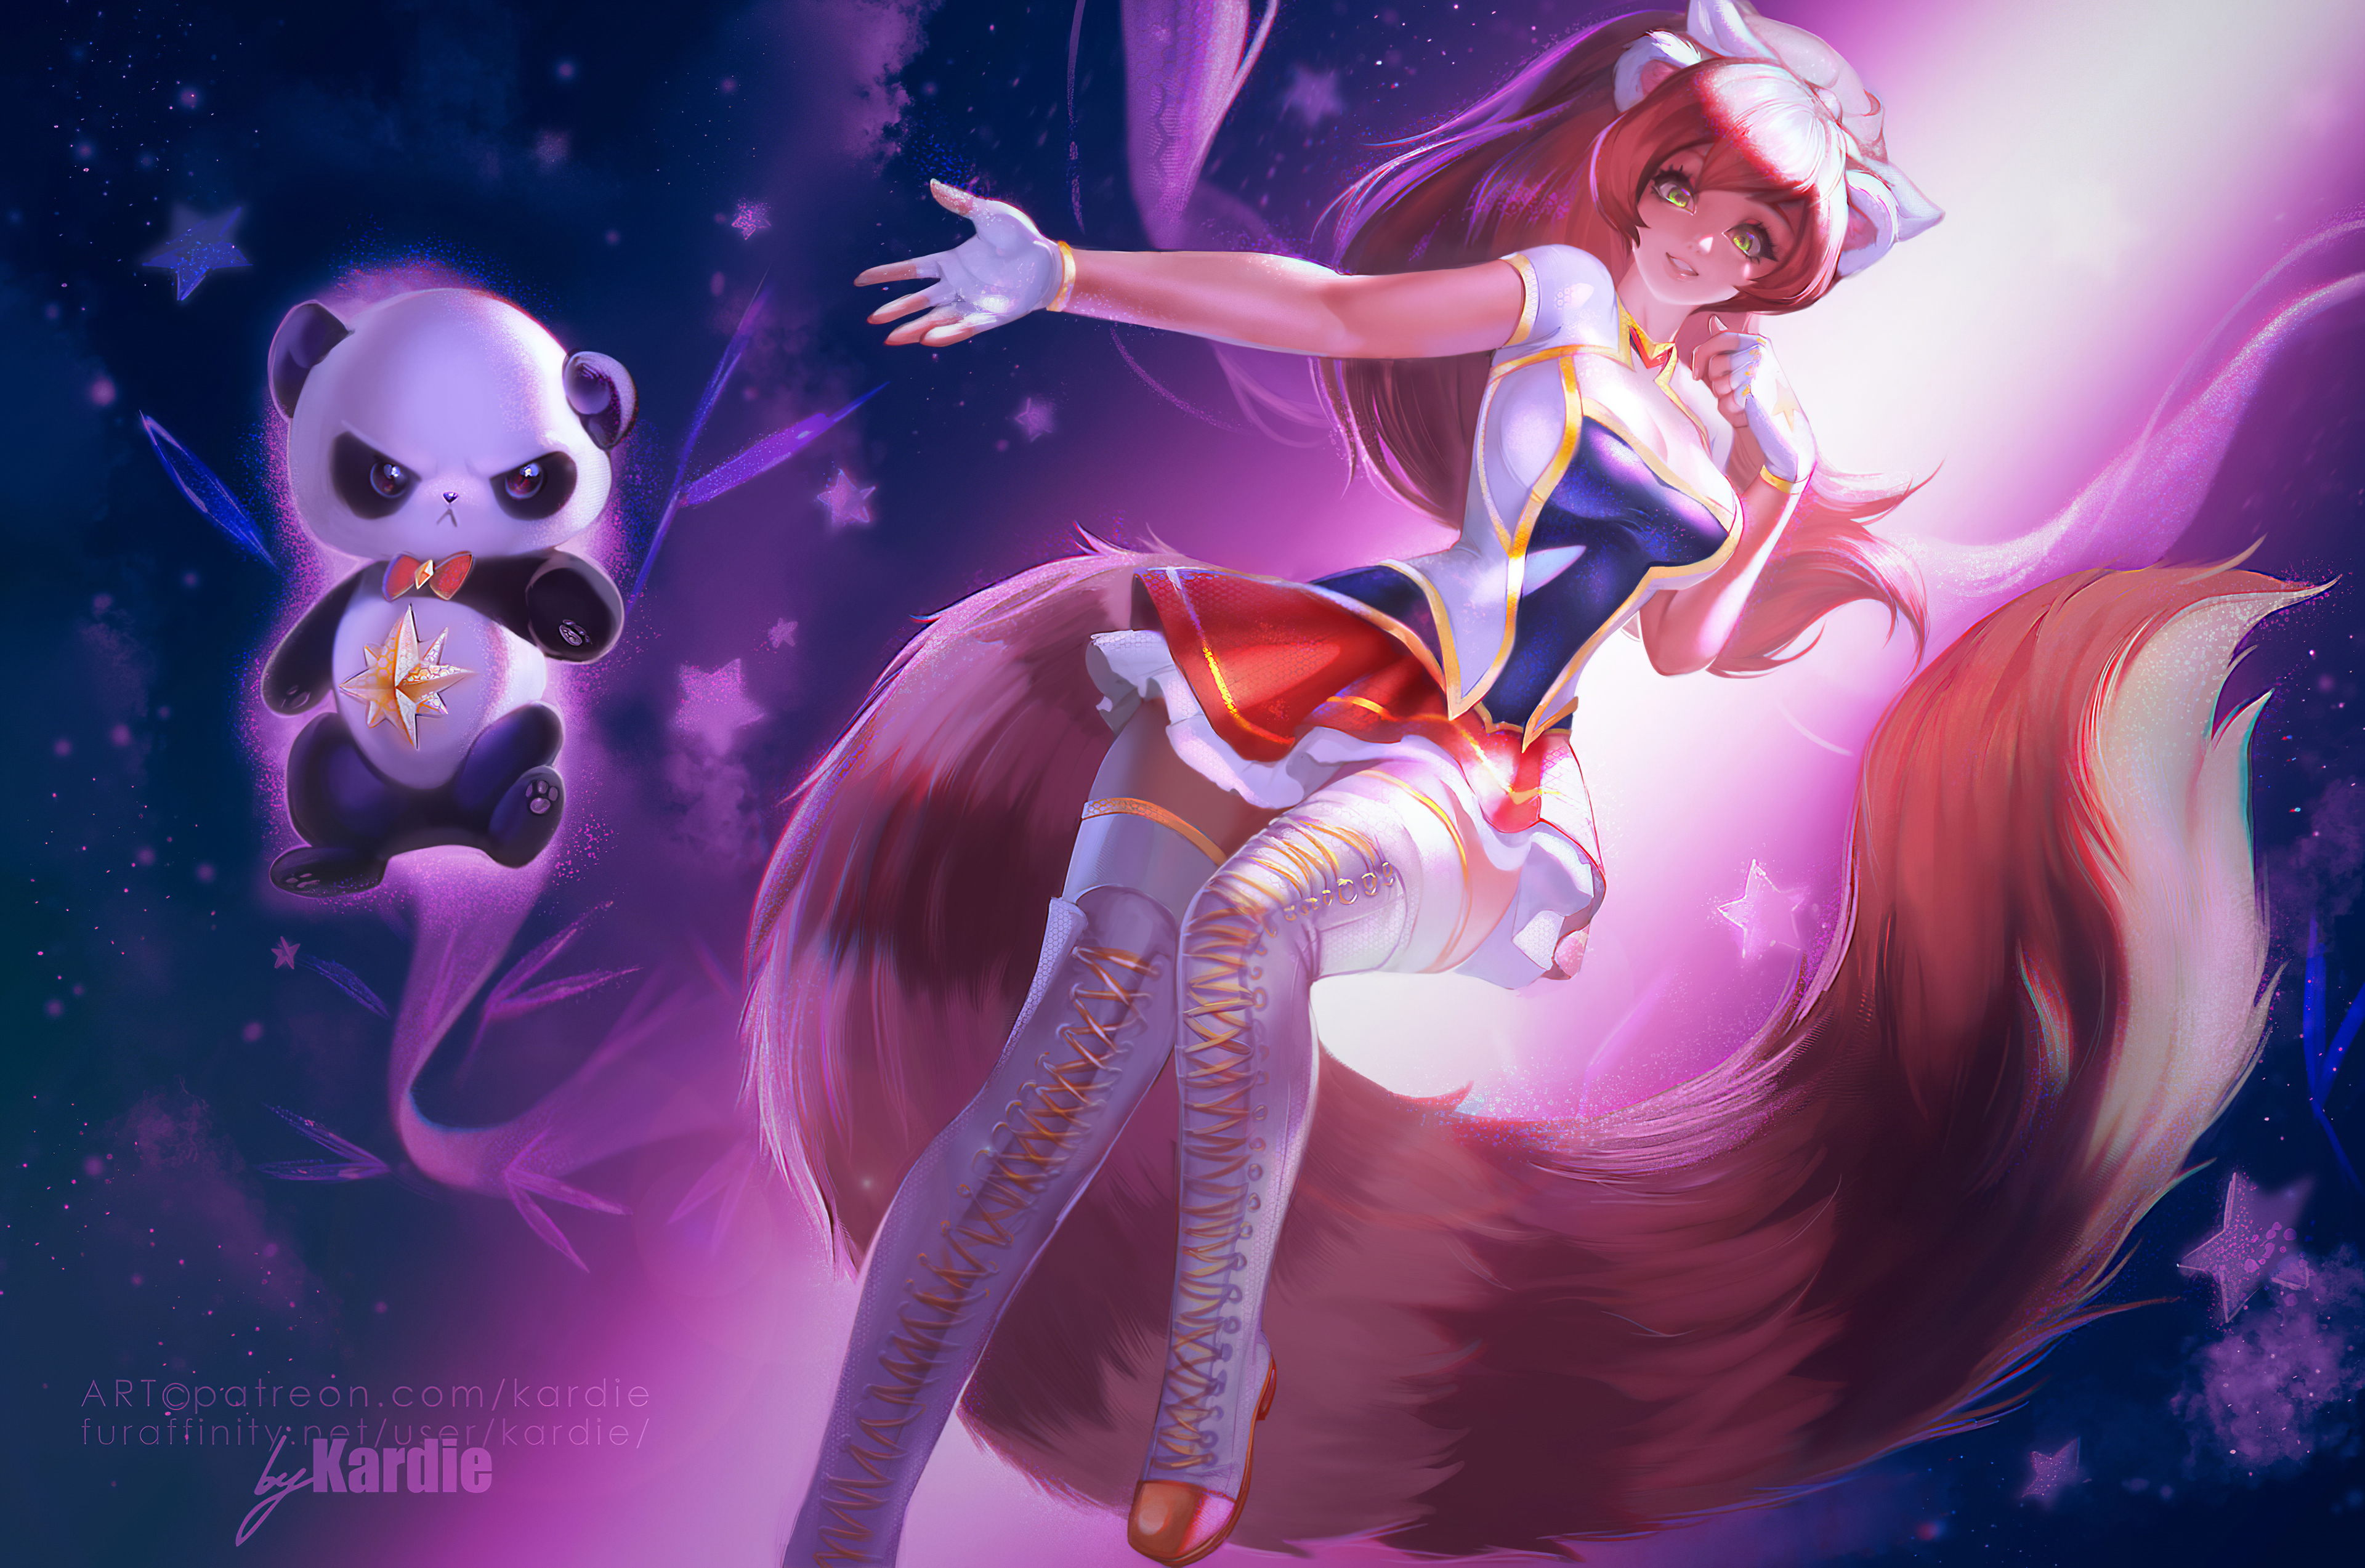 Red Panda Mei 4k, HD Anime, 4k Wallpapers, Images ...